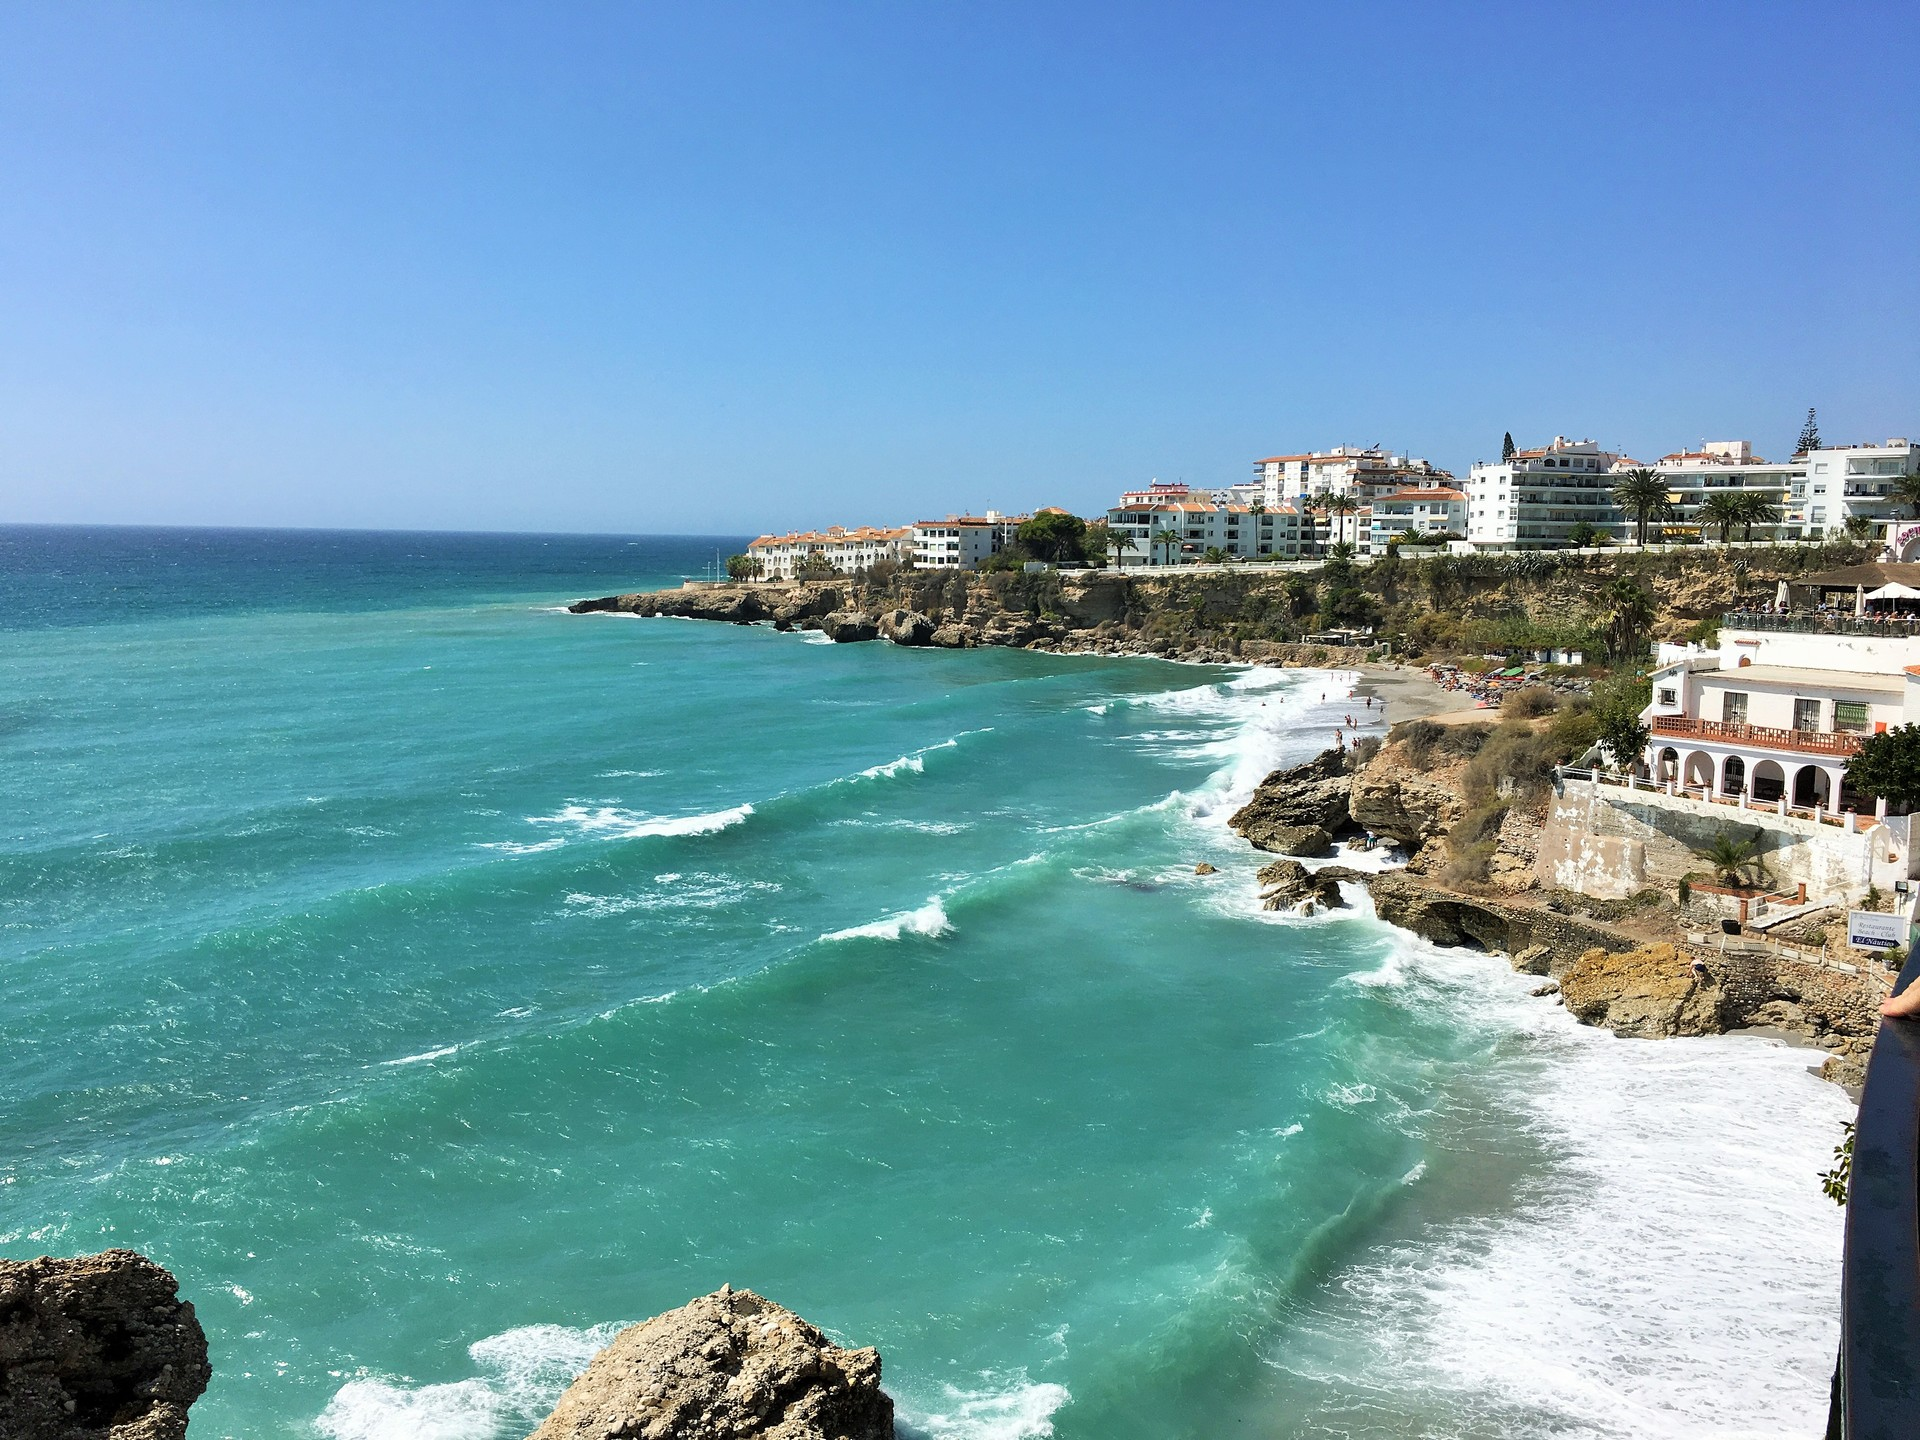 nerja-cosiest-place-costa-del-sol-ee0323